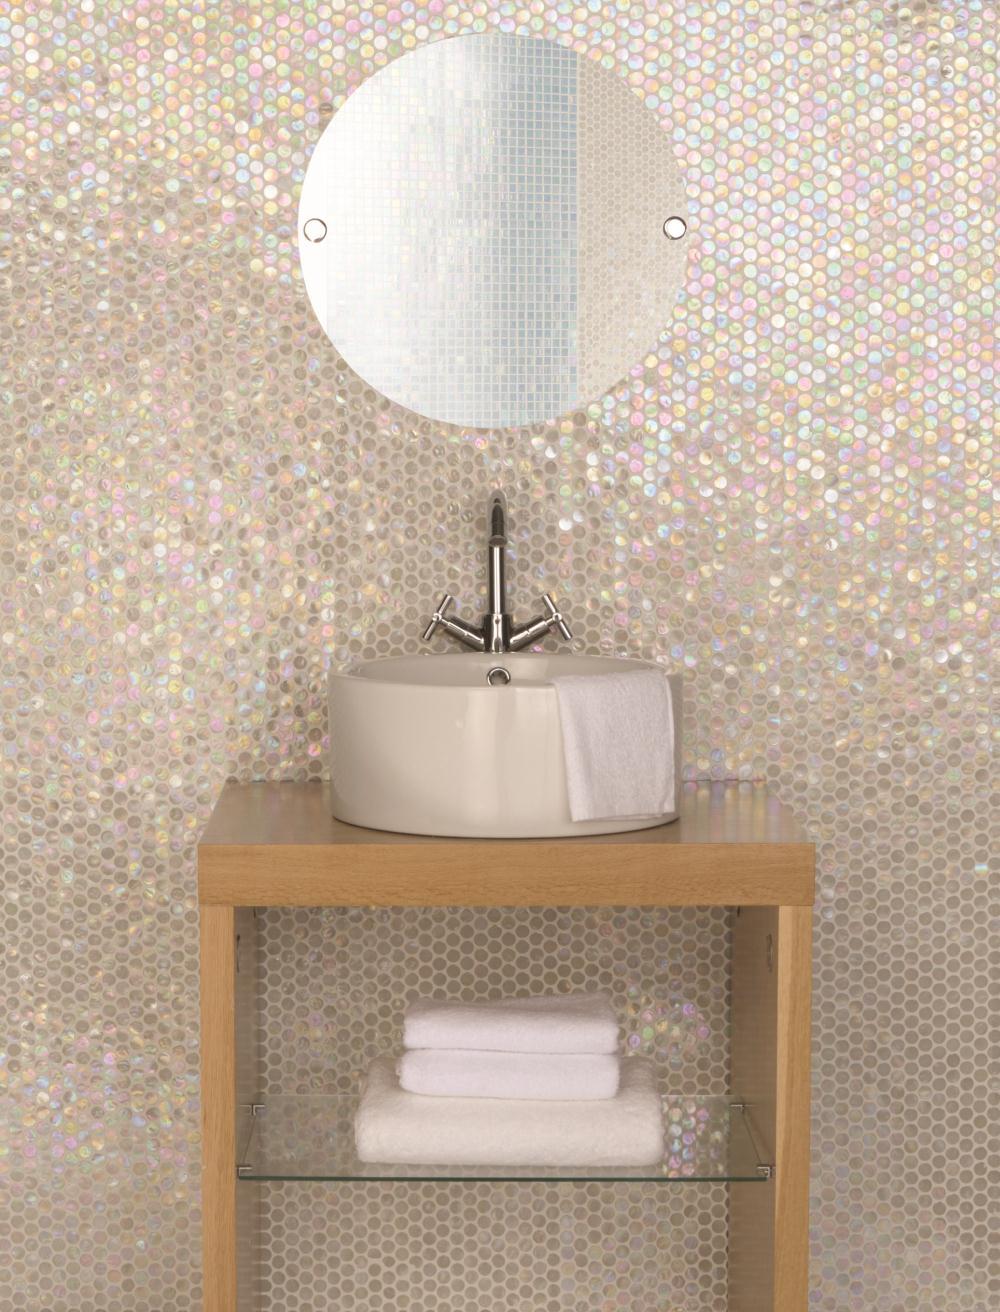 White lady irridescent shapes | AJD - Tile Inspiration | Pinterest ...